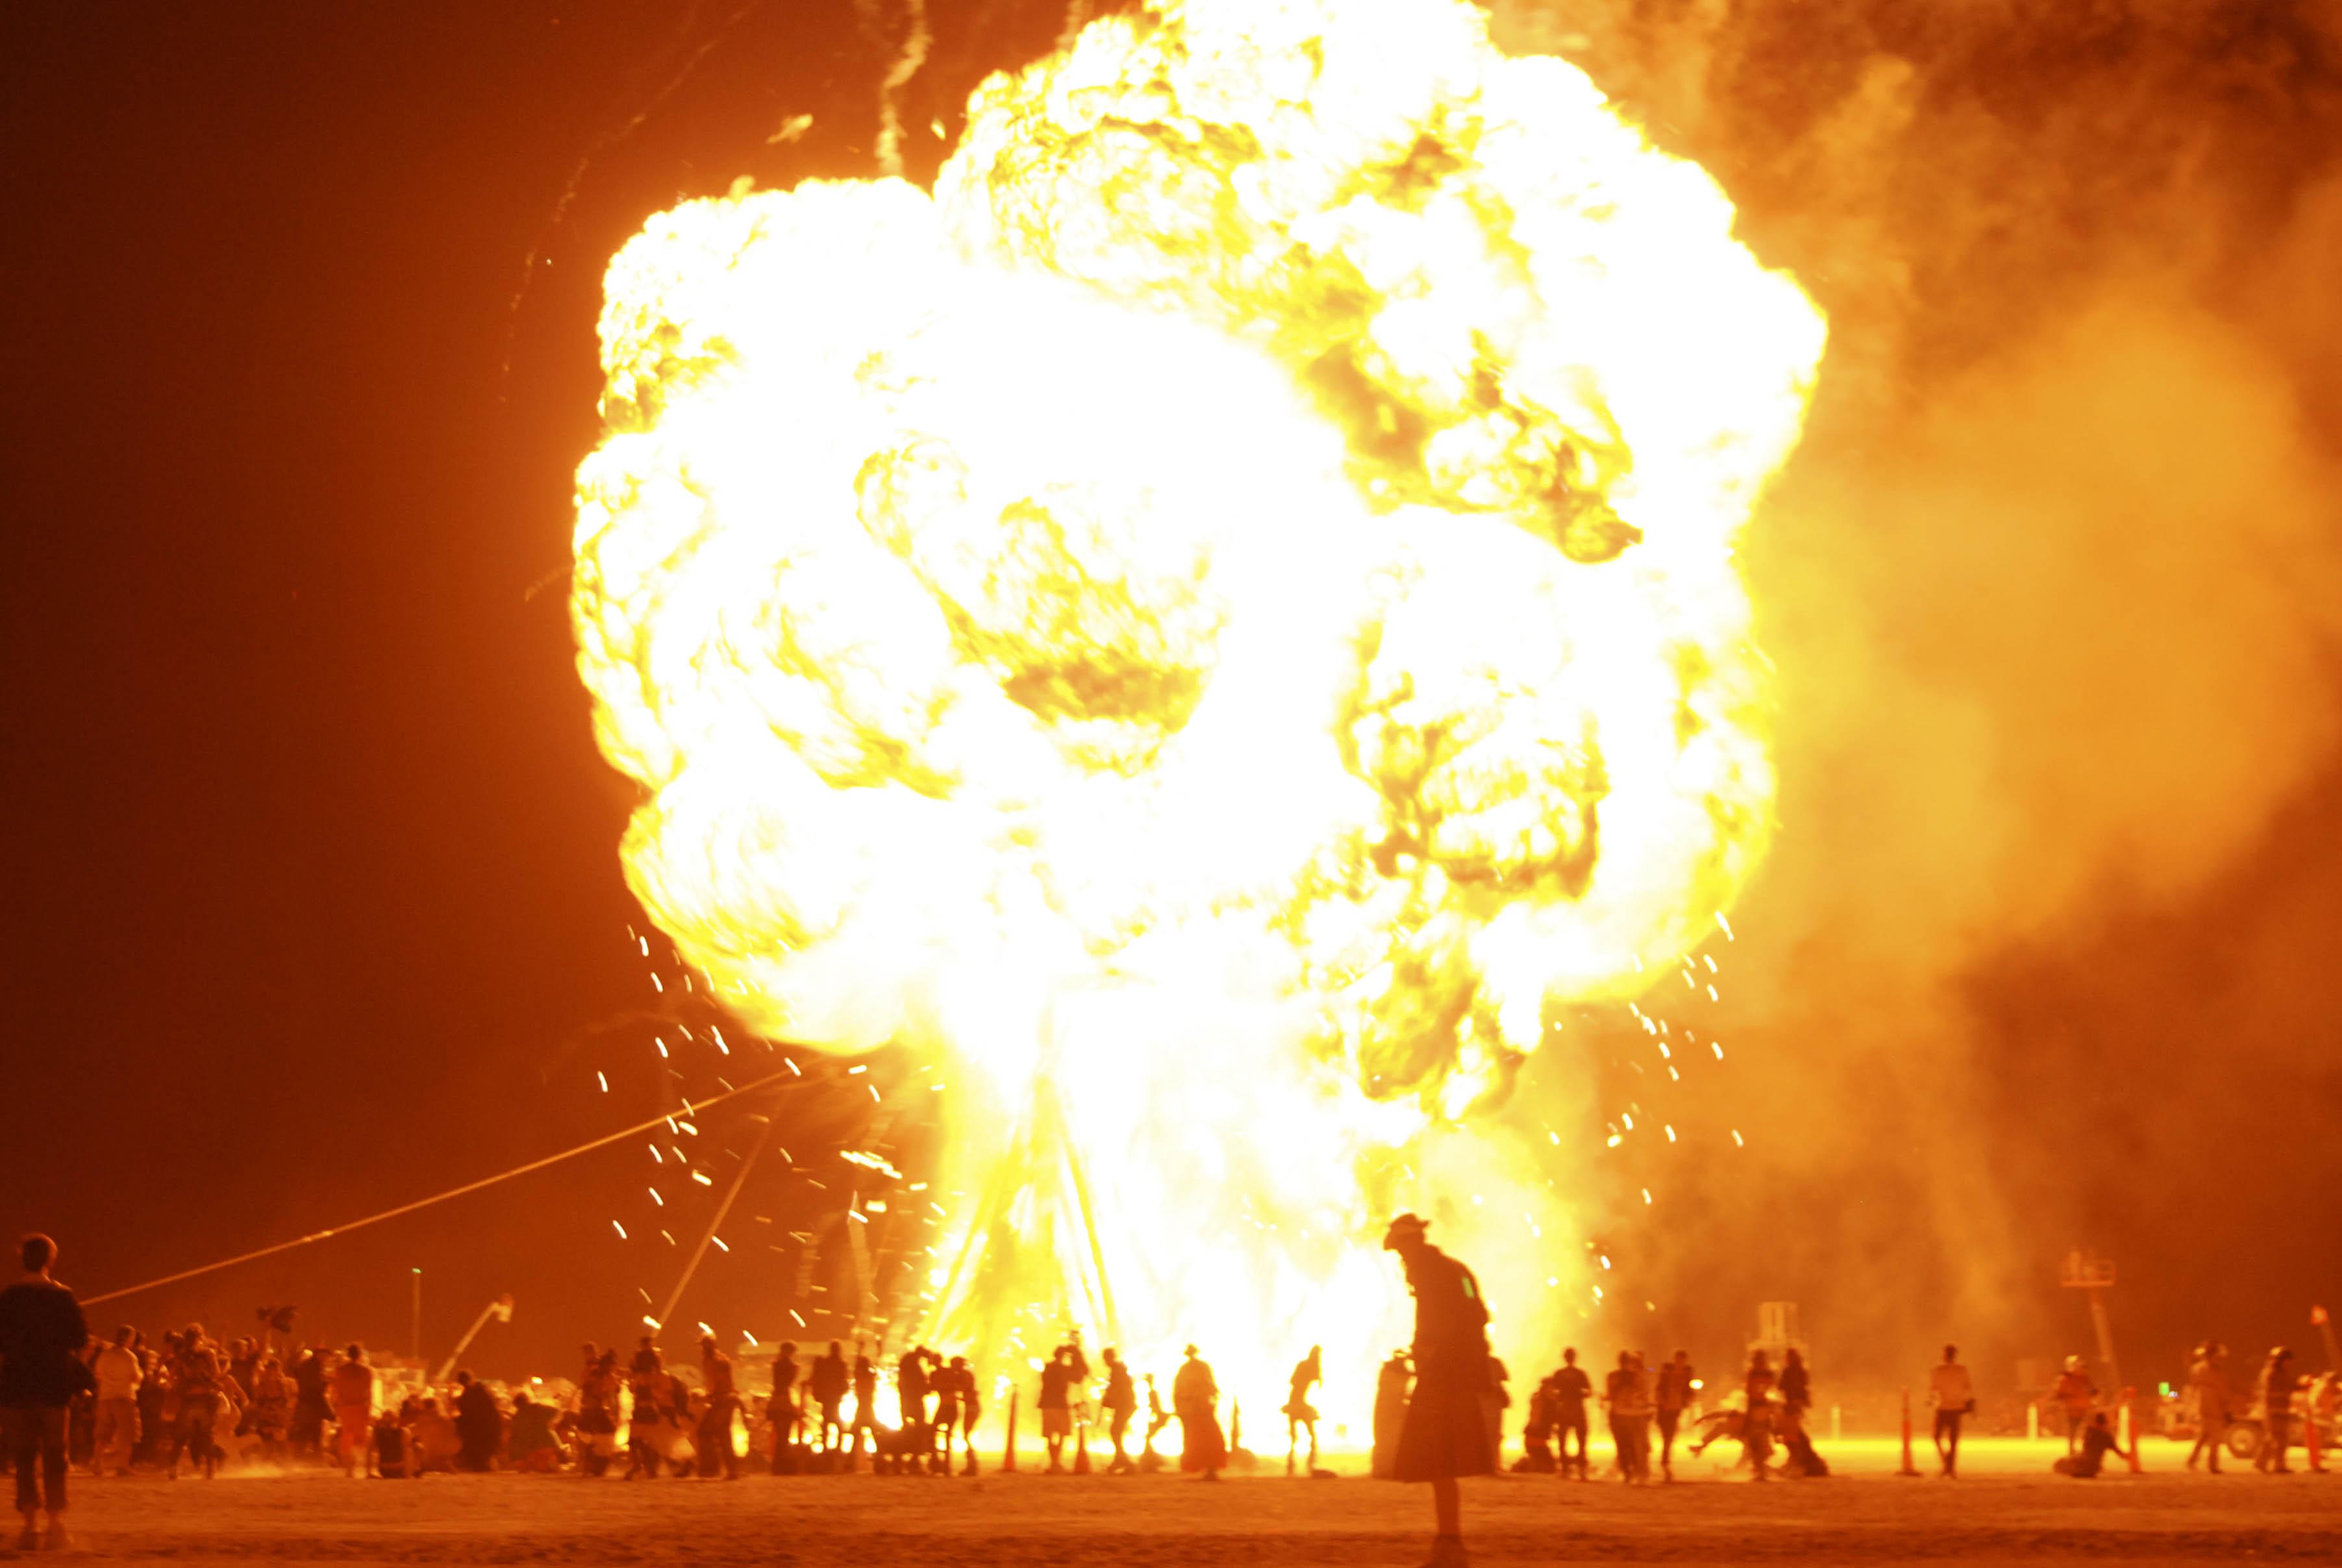 Explosions Backgrounds, Compatible - PC, Mobile, Gadgets| 3607x2415 px